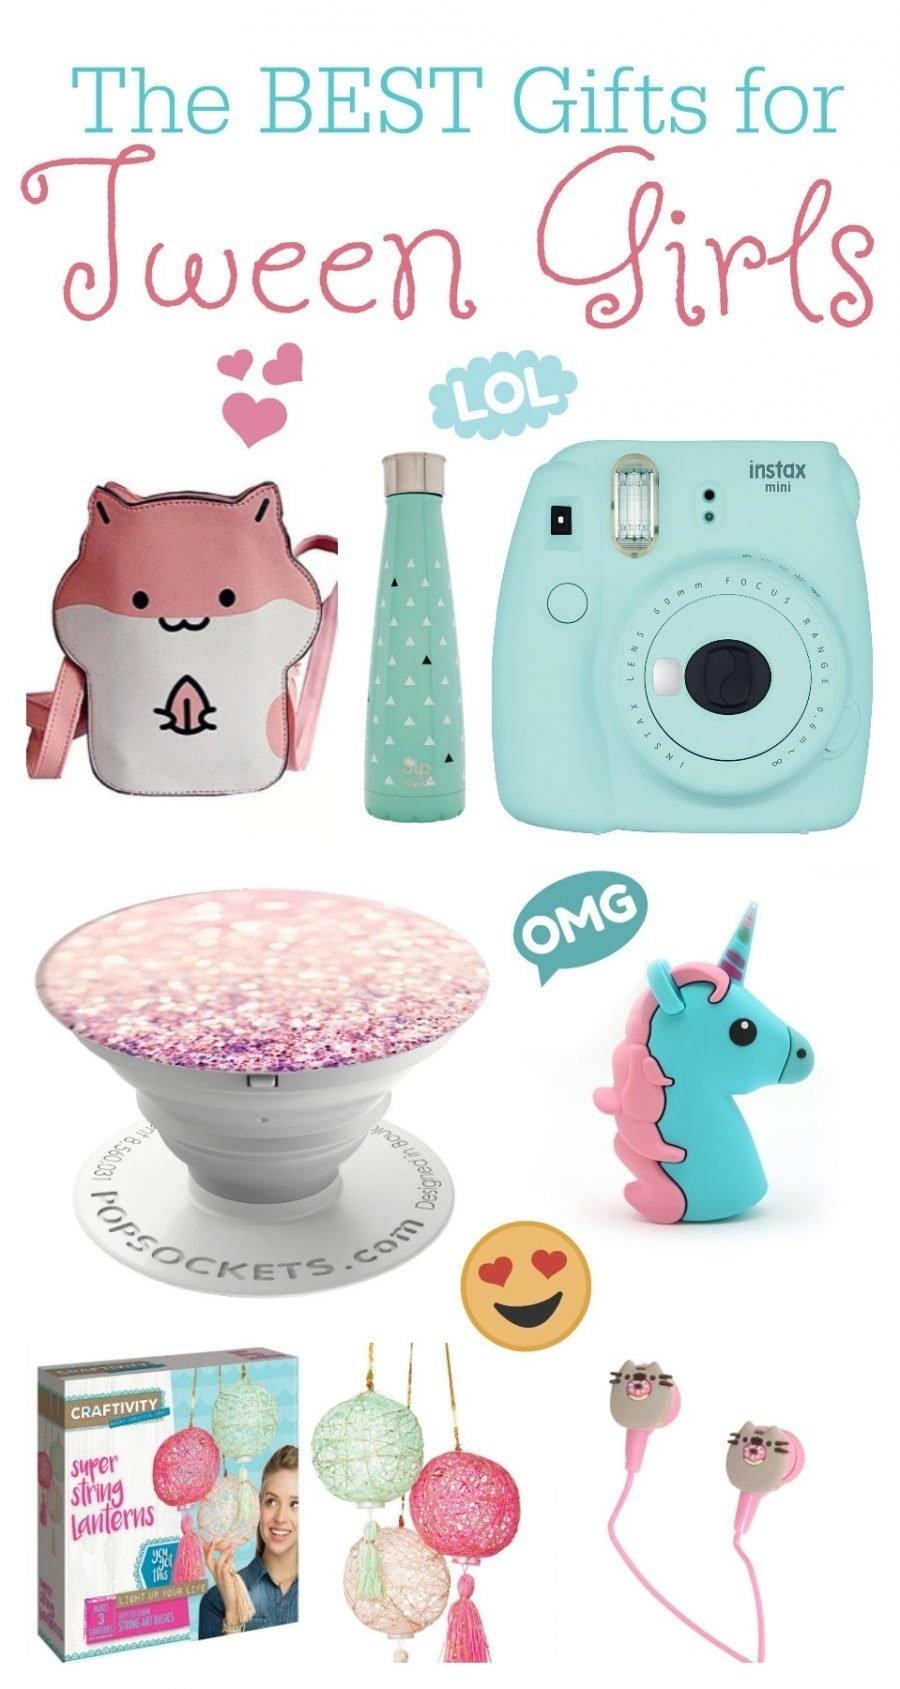 10 Attractive Tween Gift Ideas For Girls the best gift ideas for tween girls 2 2020